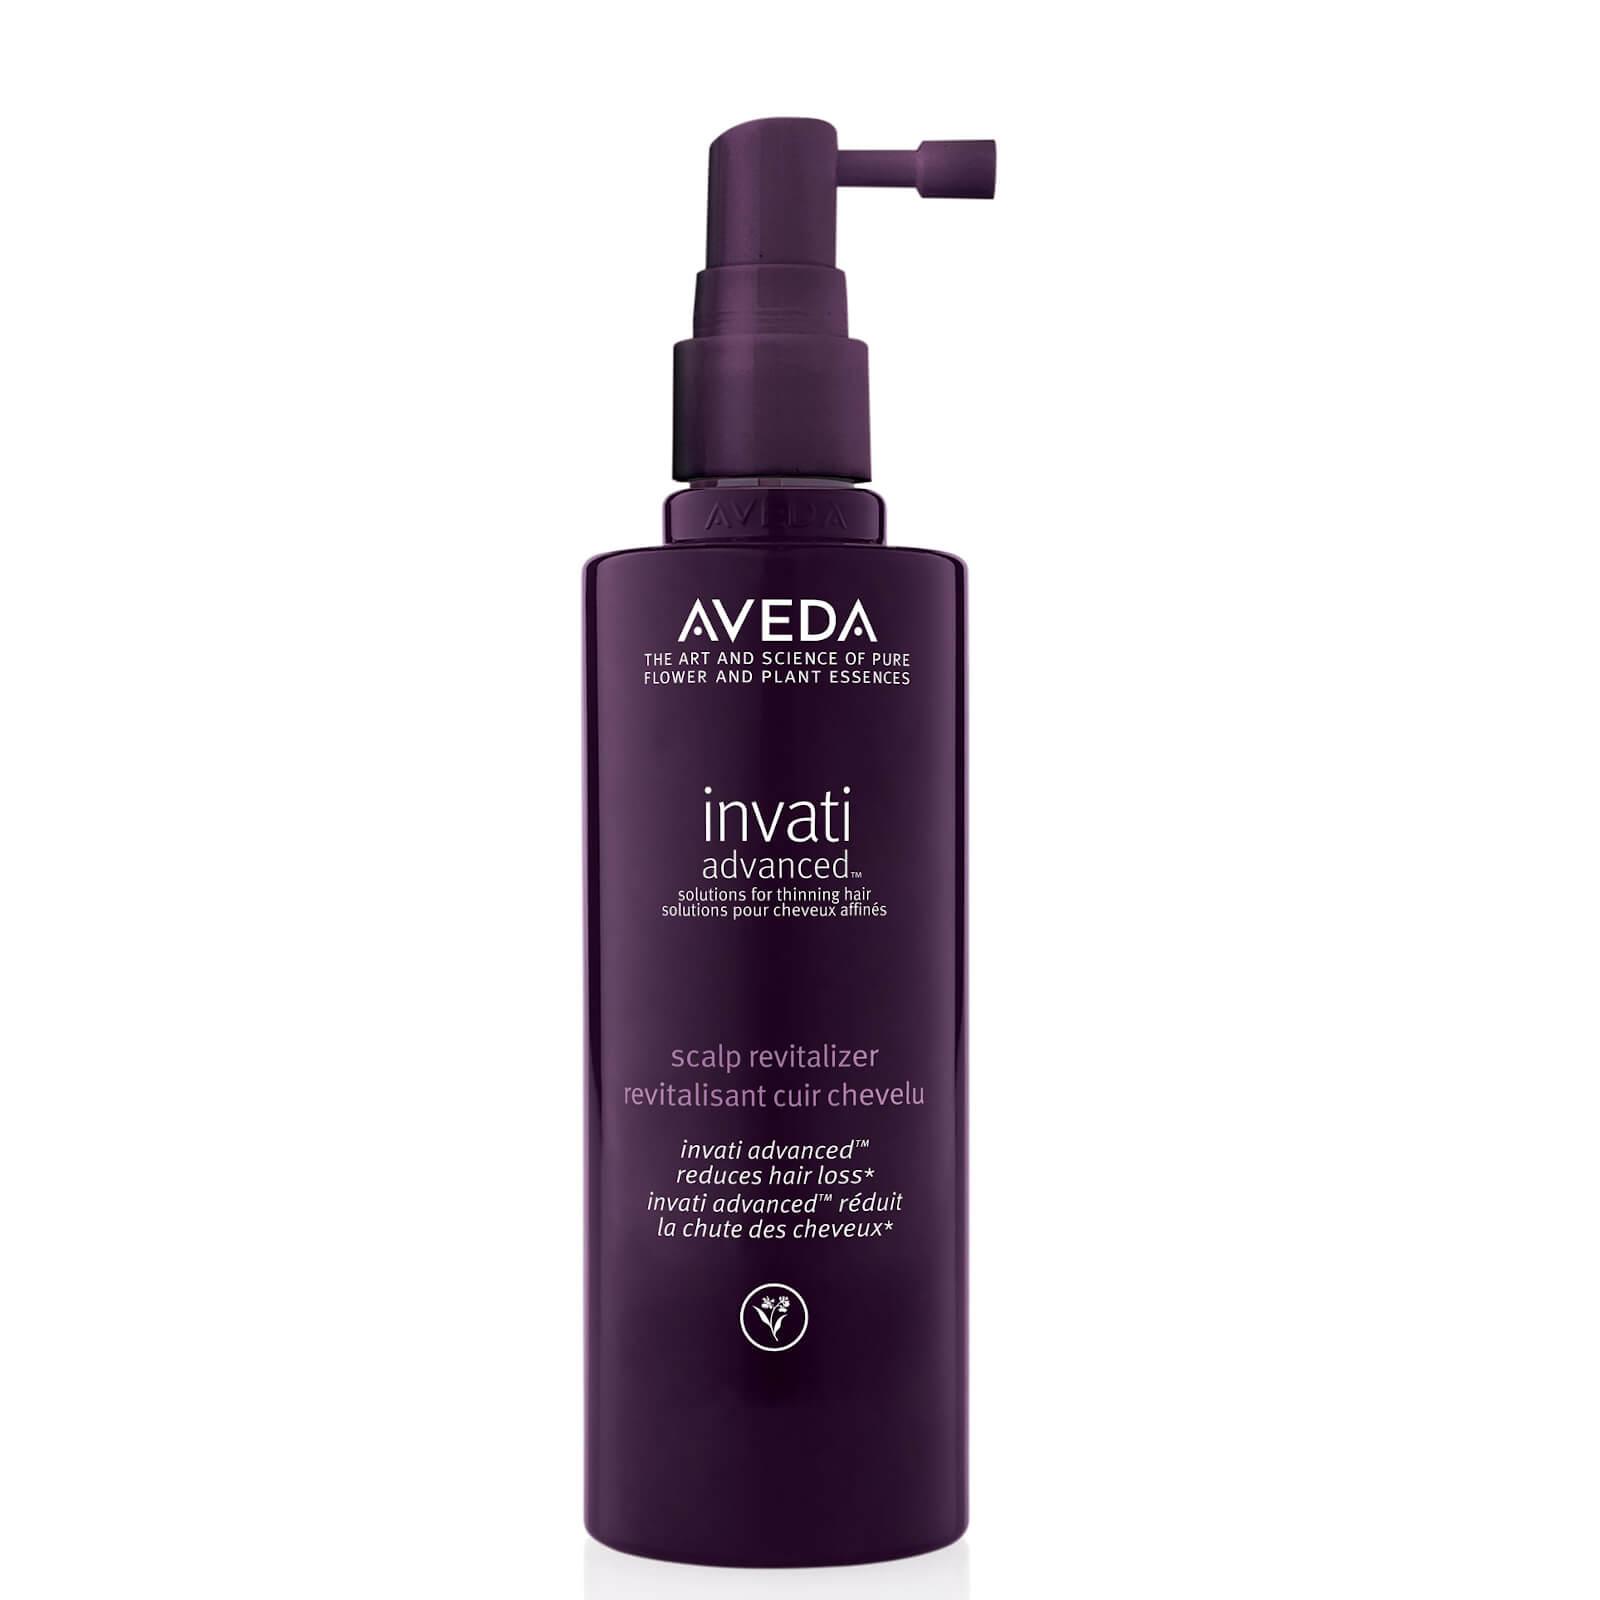 Aveda Invati Men's Scalp Revitalizer Treatment (125ml)